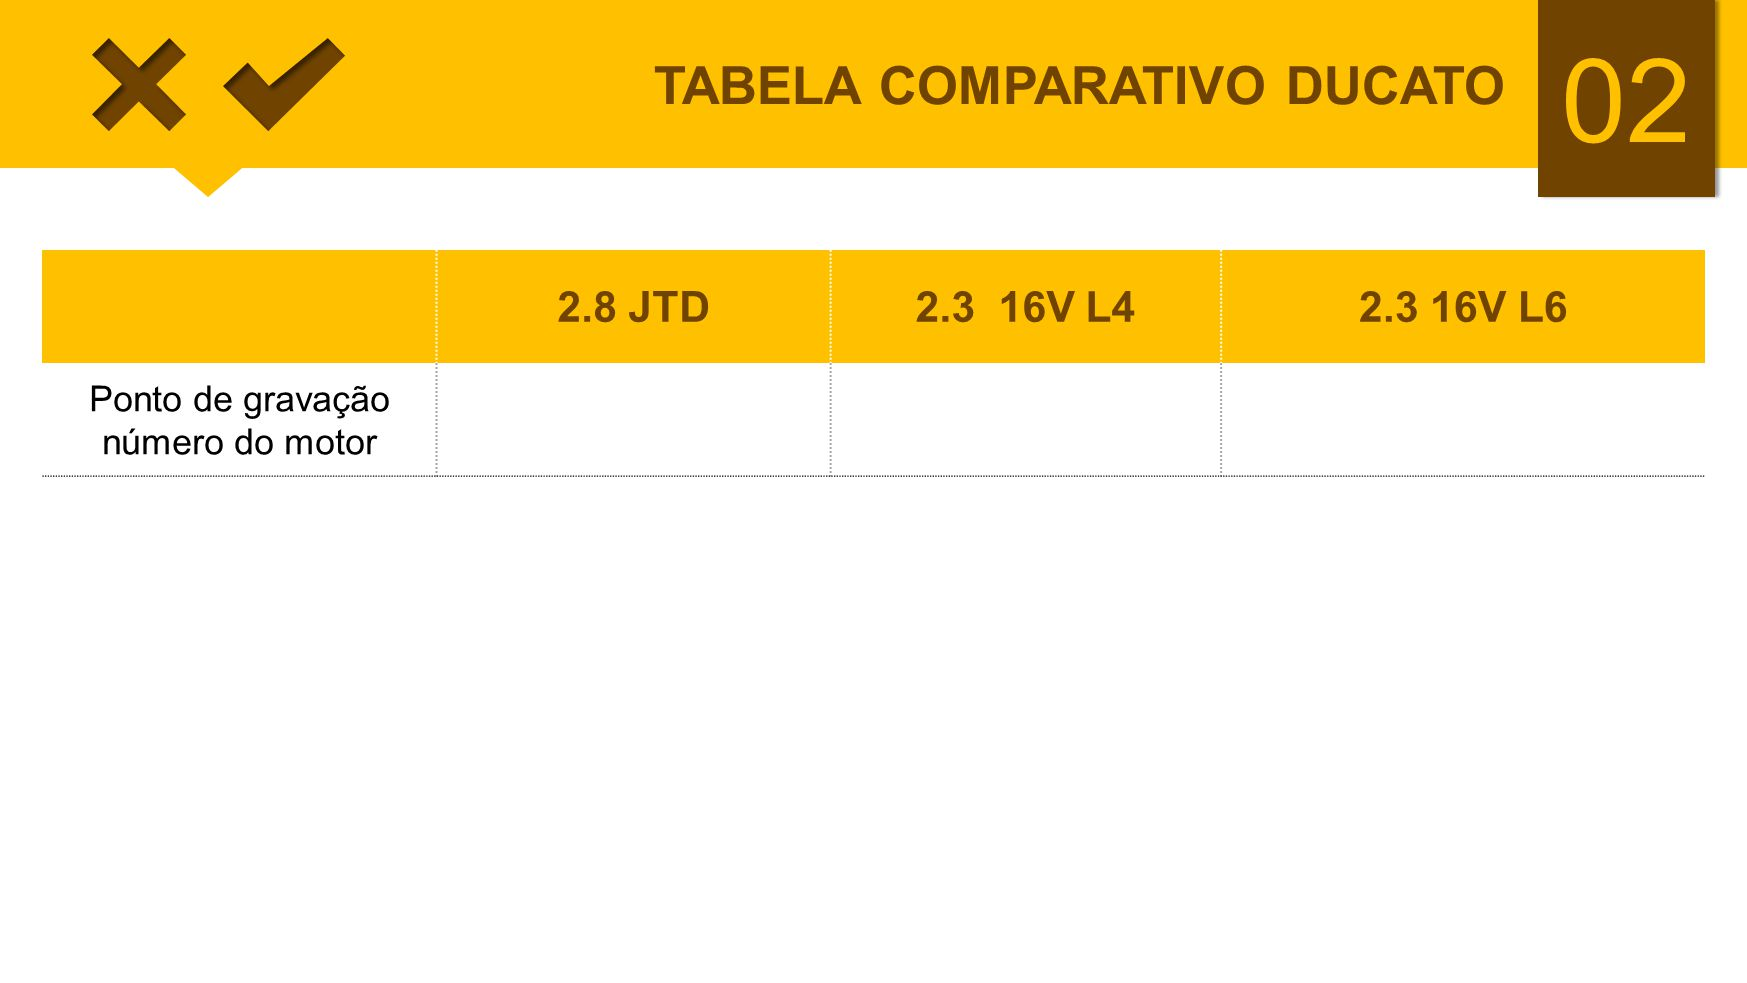 02 TABELA COMPARATIVO DUCATO 2.8 JTD 2.3 16V L4 2.3 16V L6